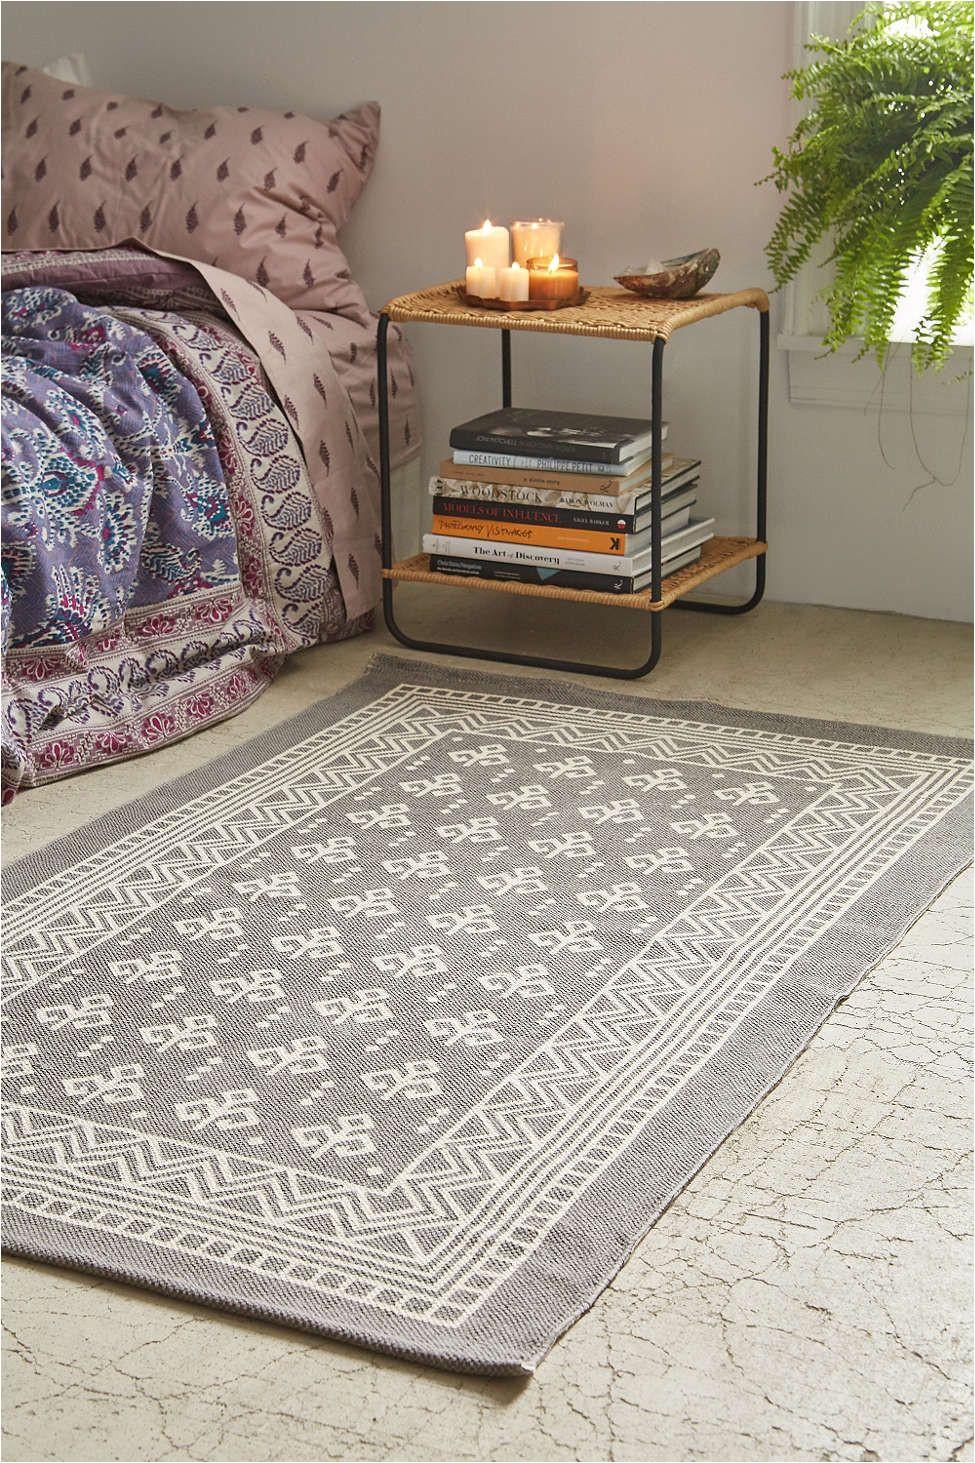 actual 8x10 master bedroom rug 199 magical thinking boho border printed rug